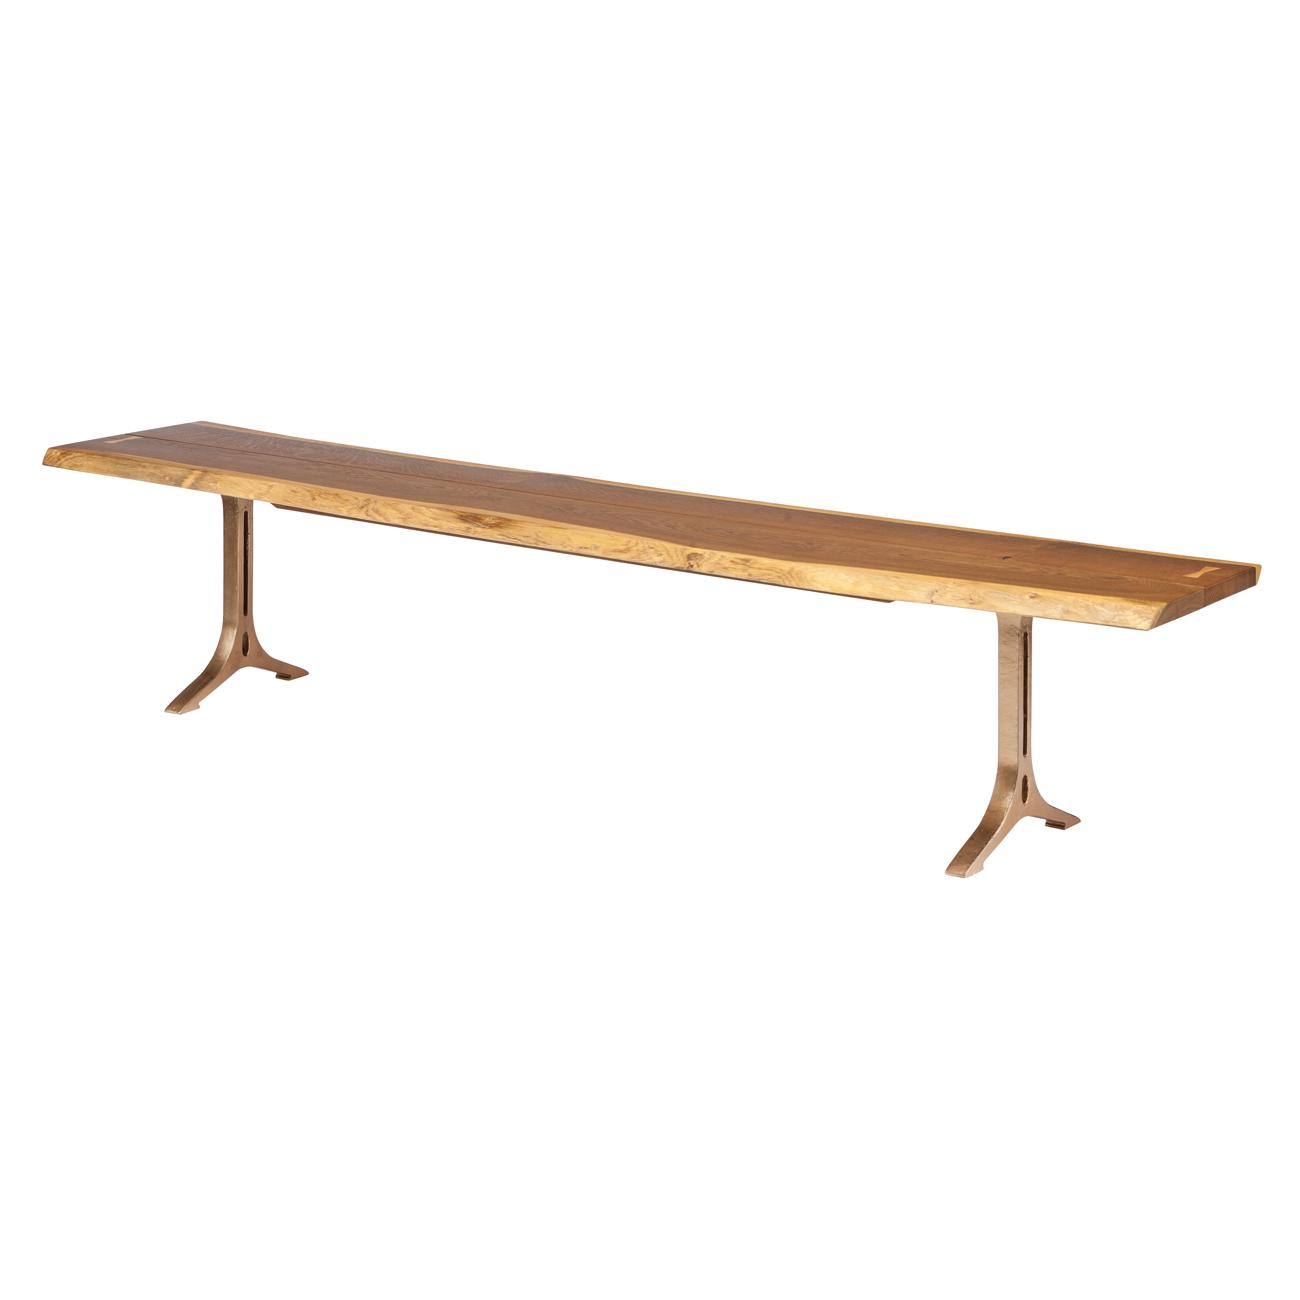 Amity Industrial Loft Honey Oak Bronze Dining Bench - 88.25W